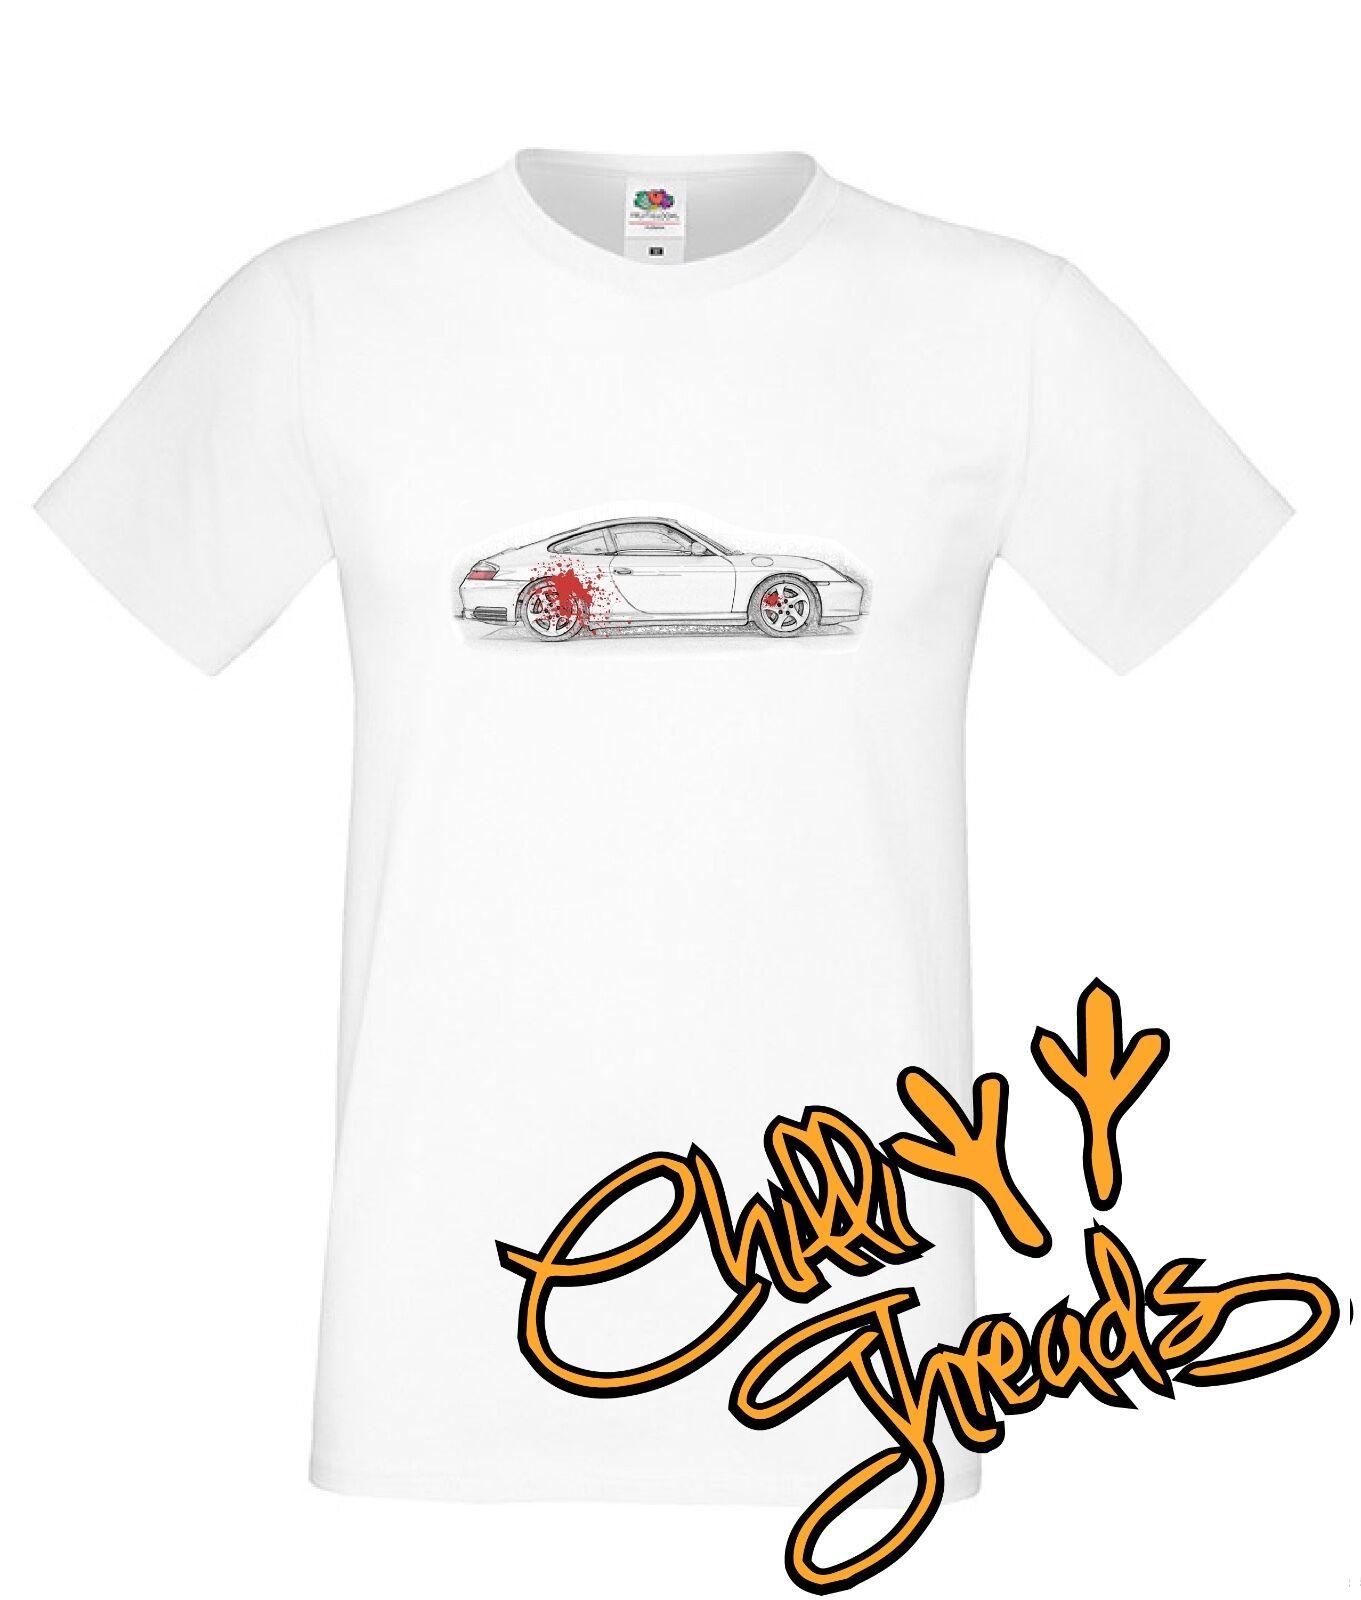 Arte del coche 996 4S C4S camiseta premium (001) camiseta de moda de verano para hombre, cómoda camiseta 2019 camiseta de moda